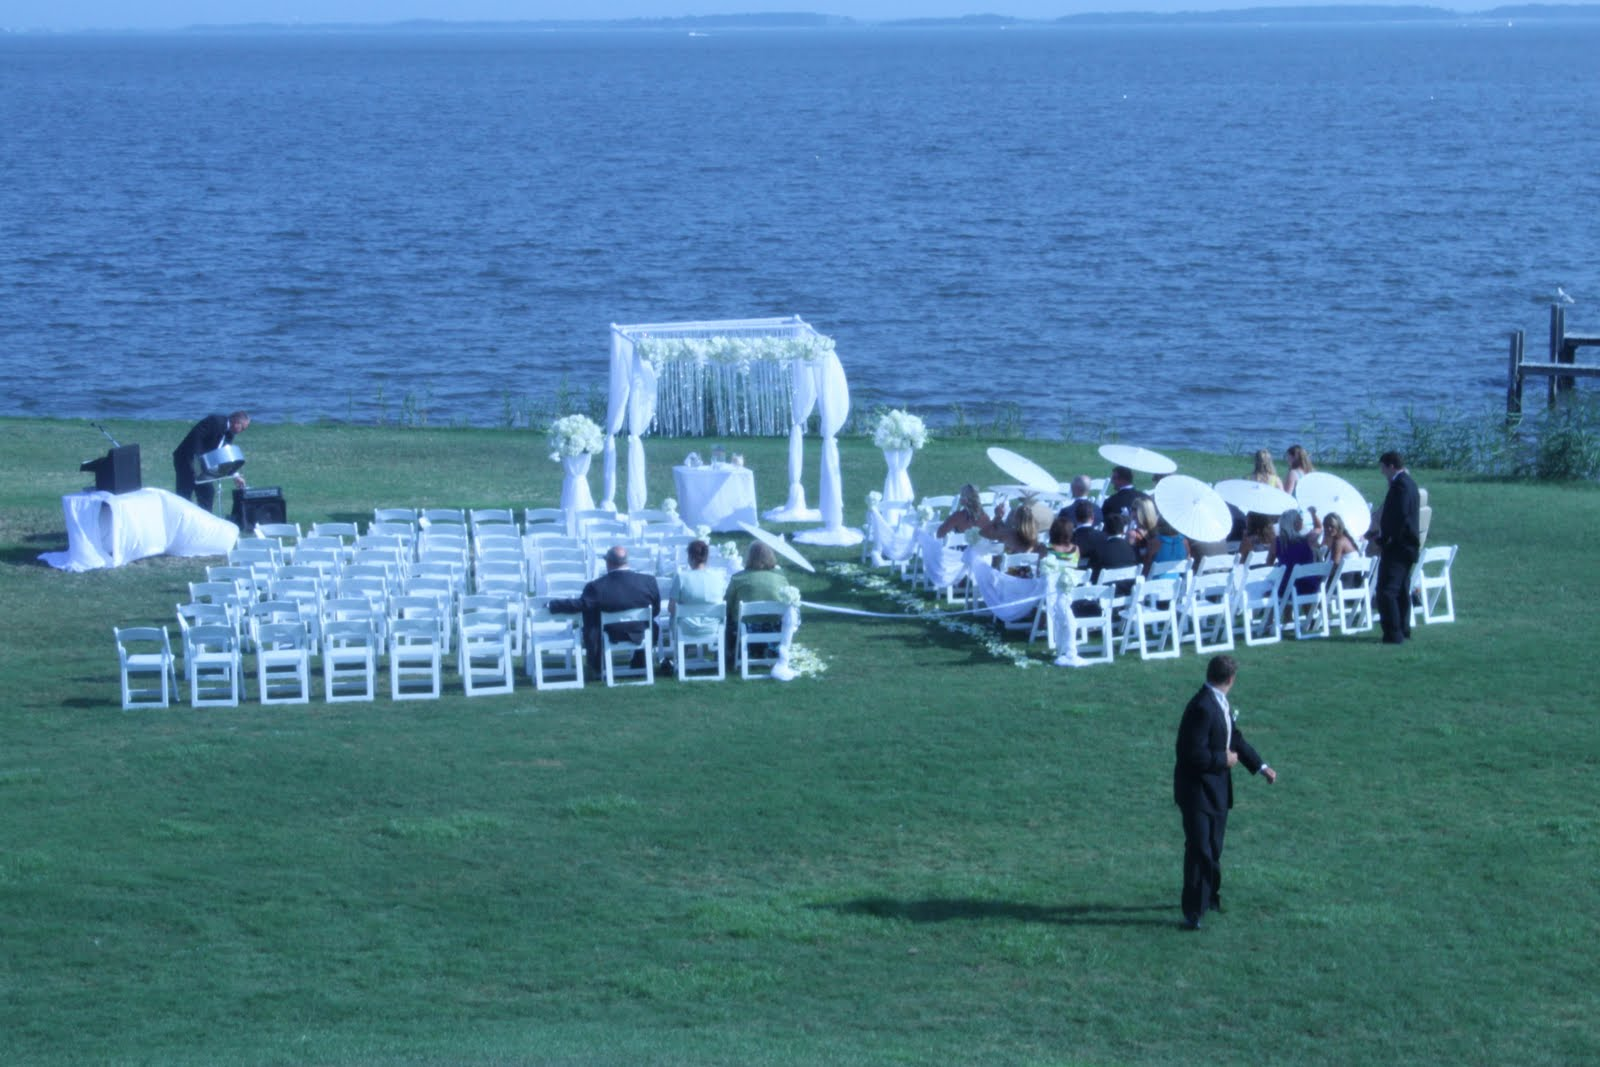 Weddings florist washington dc for Beach weddings in washington state